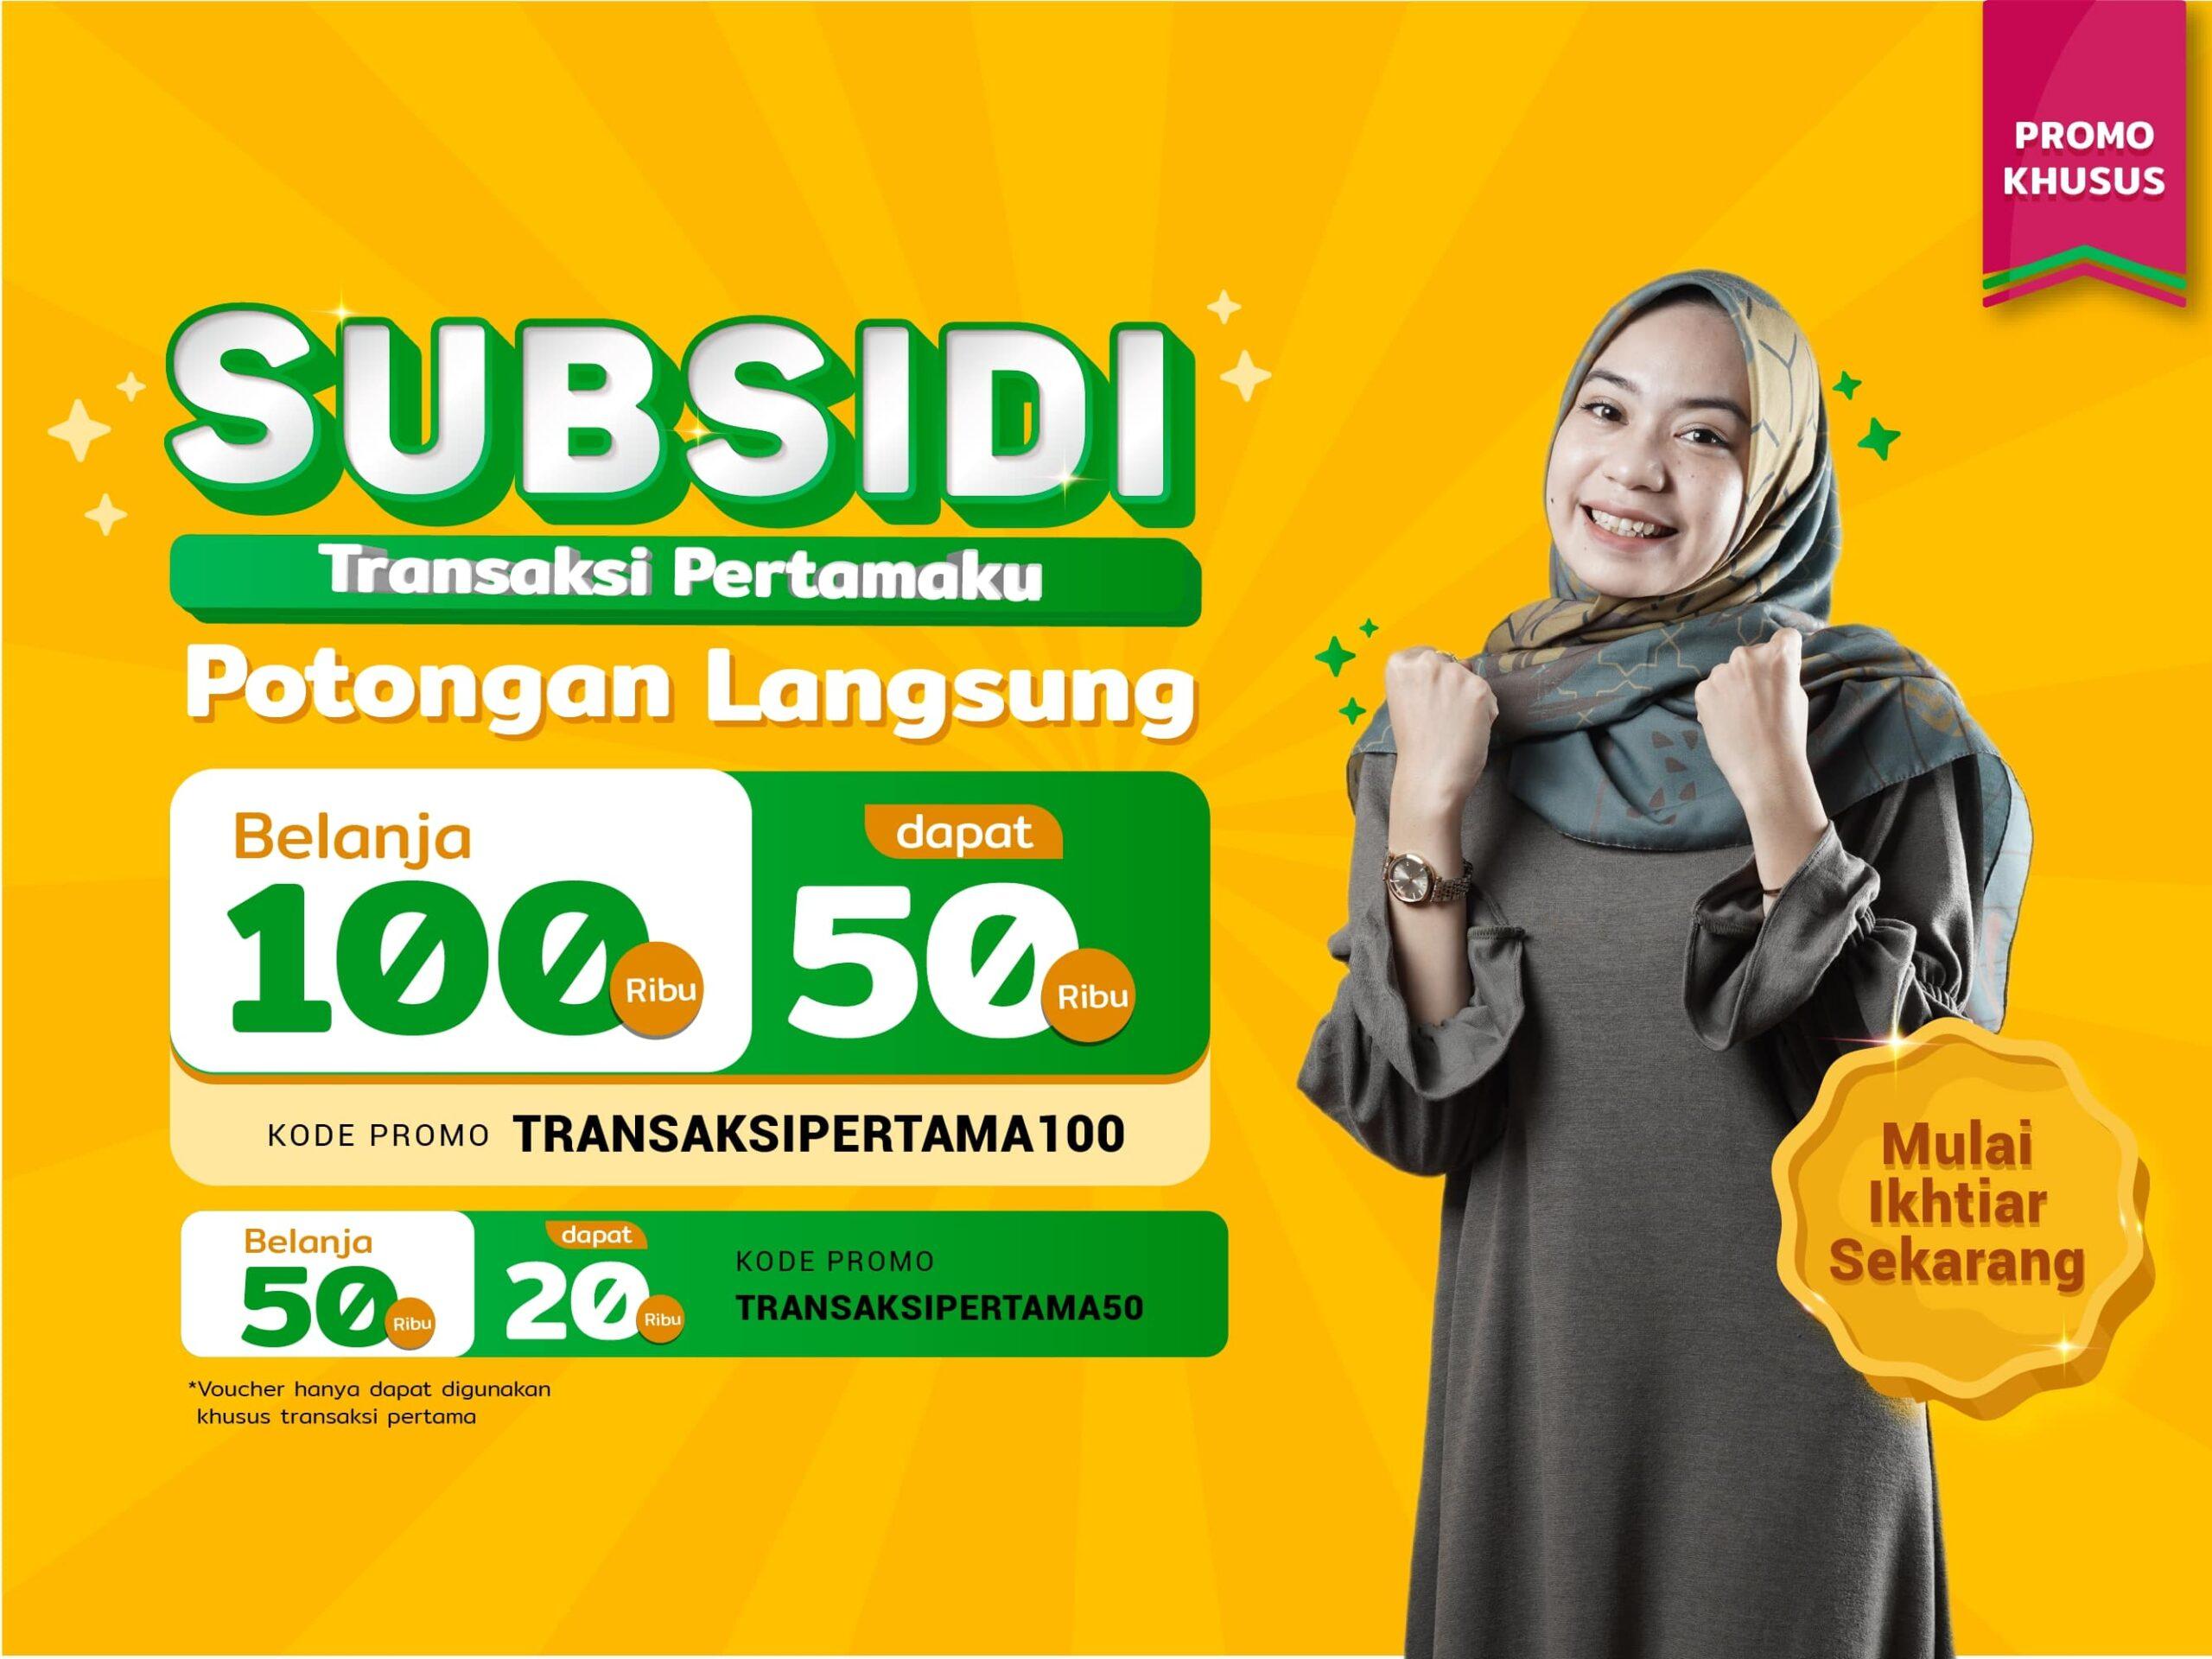 Subsidi Transaksi Pertama